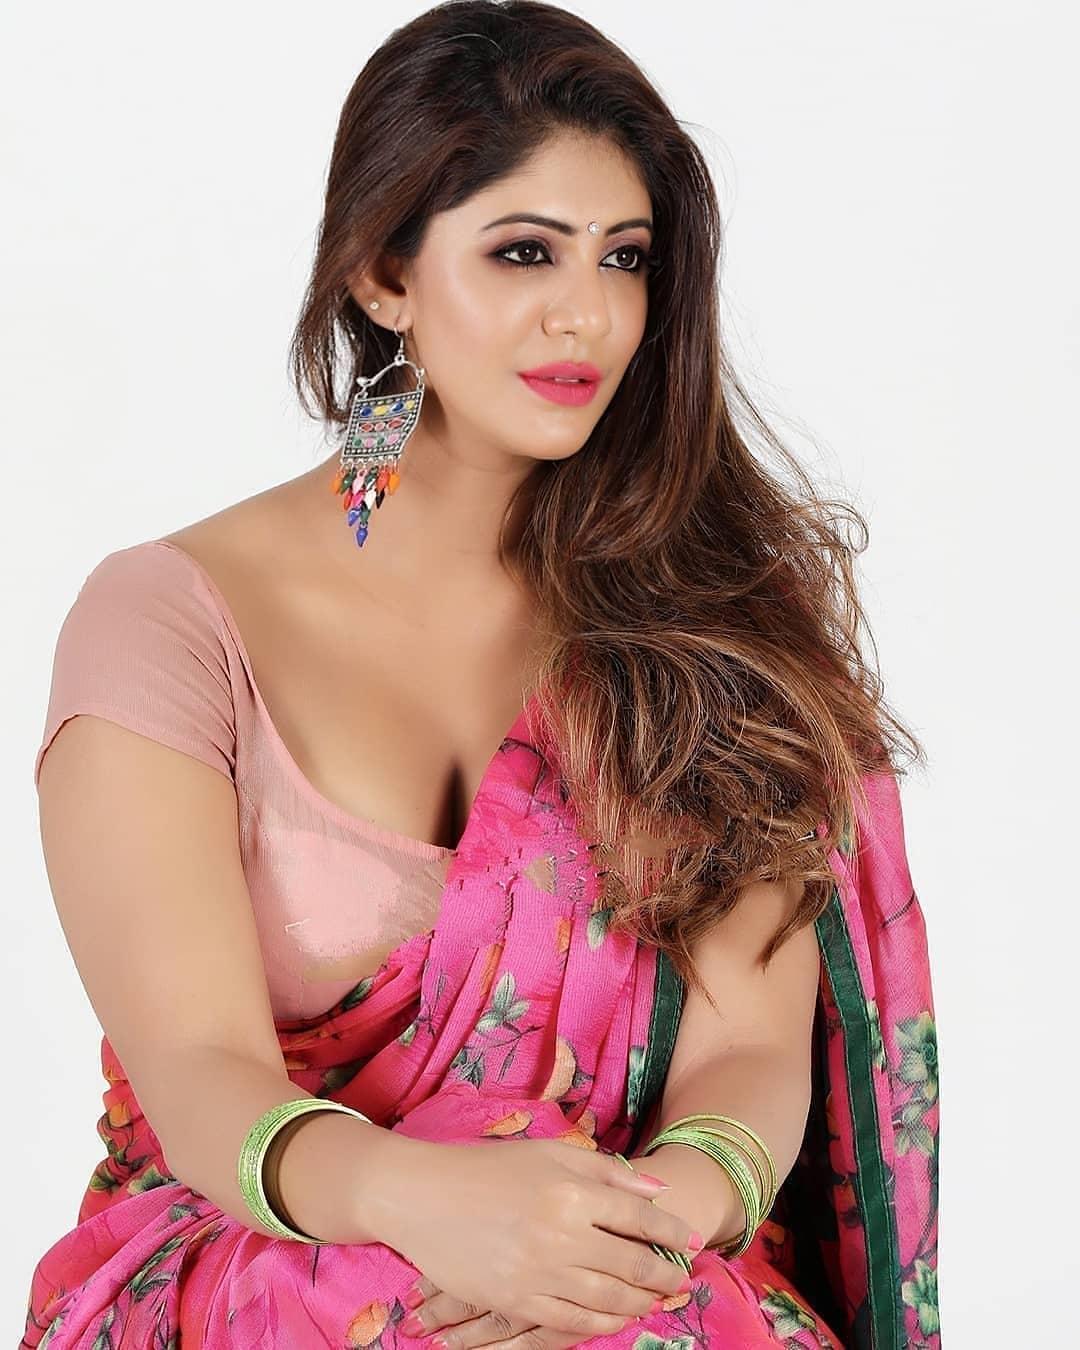 Indian Beautiful Woman in Saree Look Hot